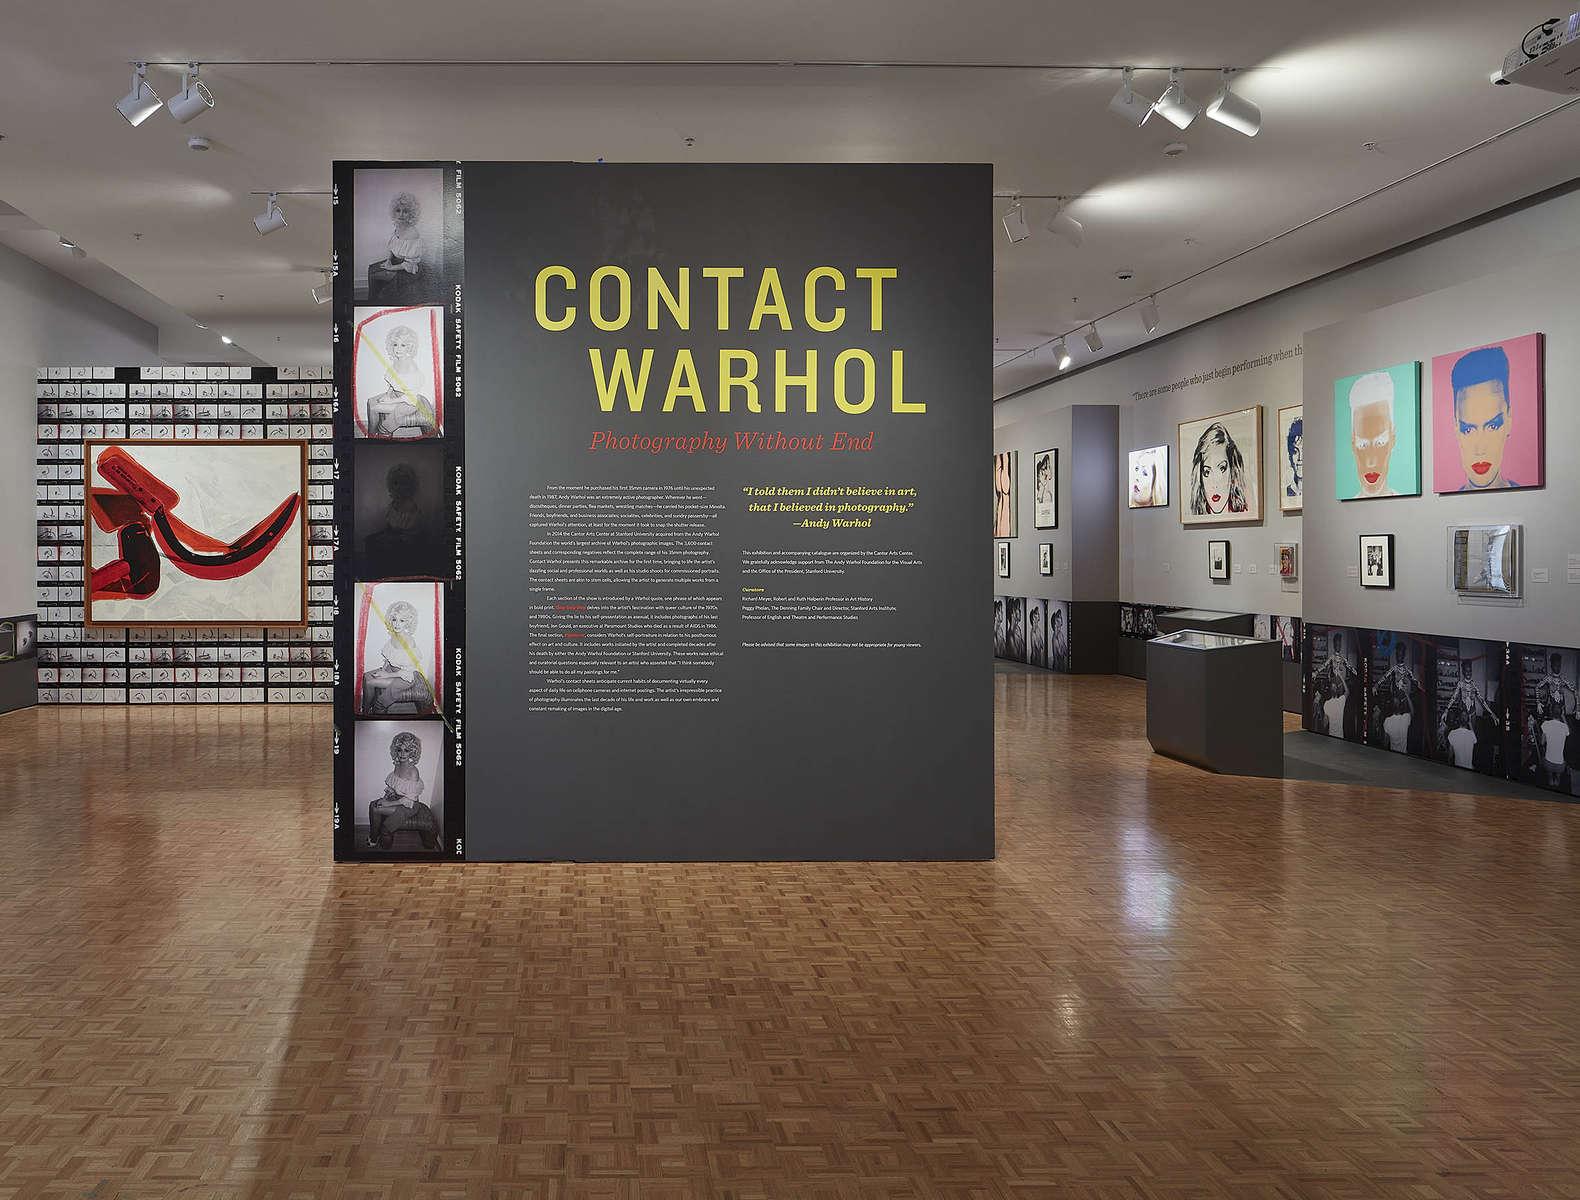 Cantor_Contact-Warhol_007